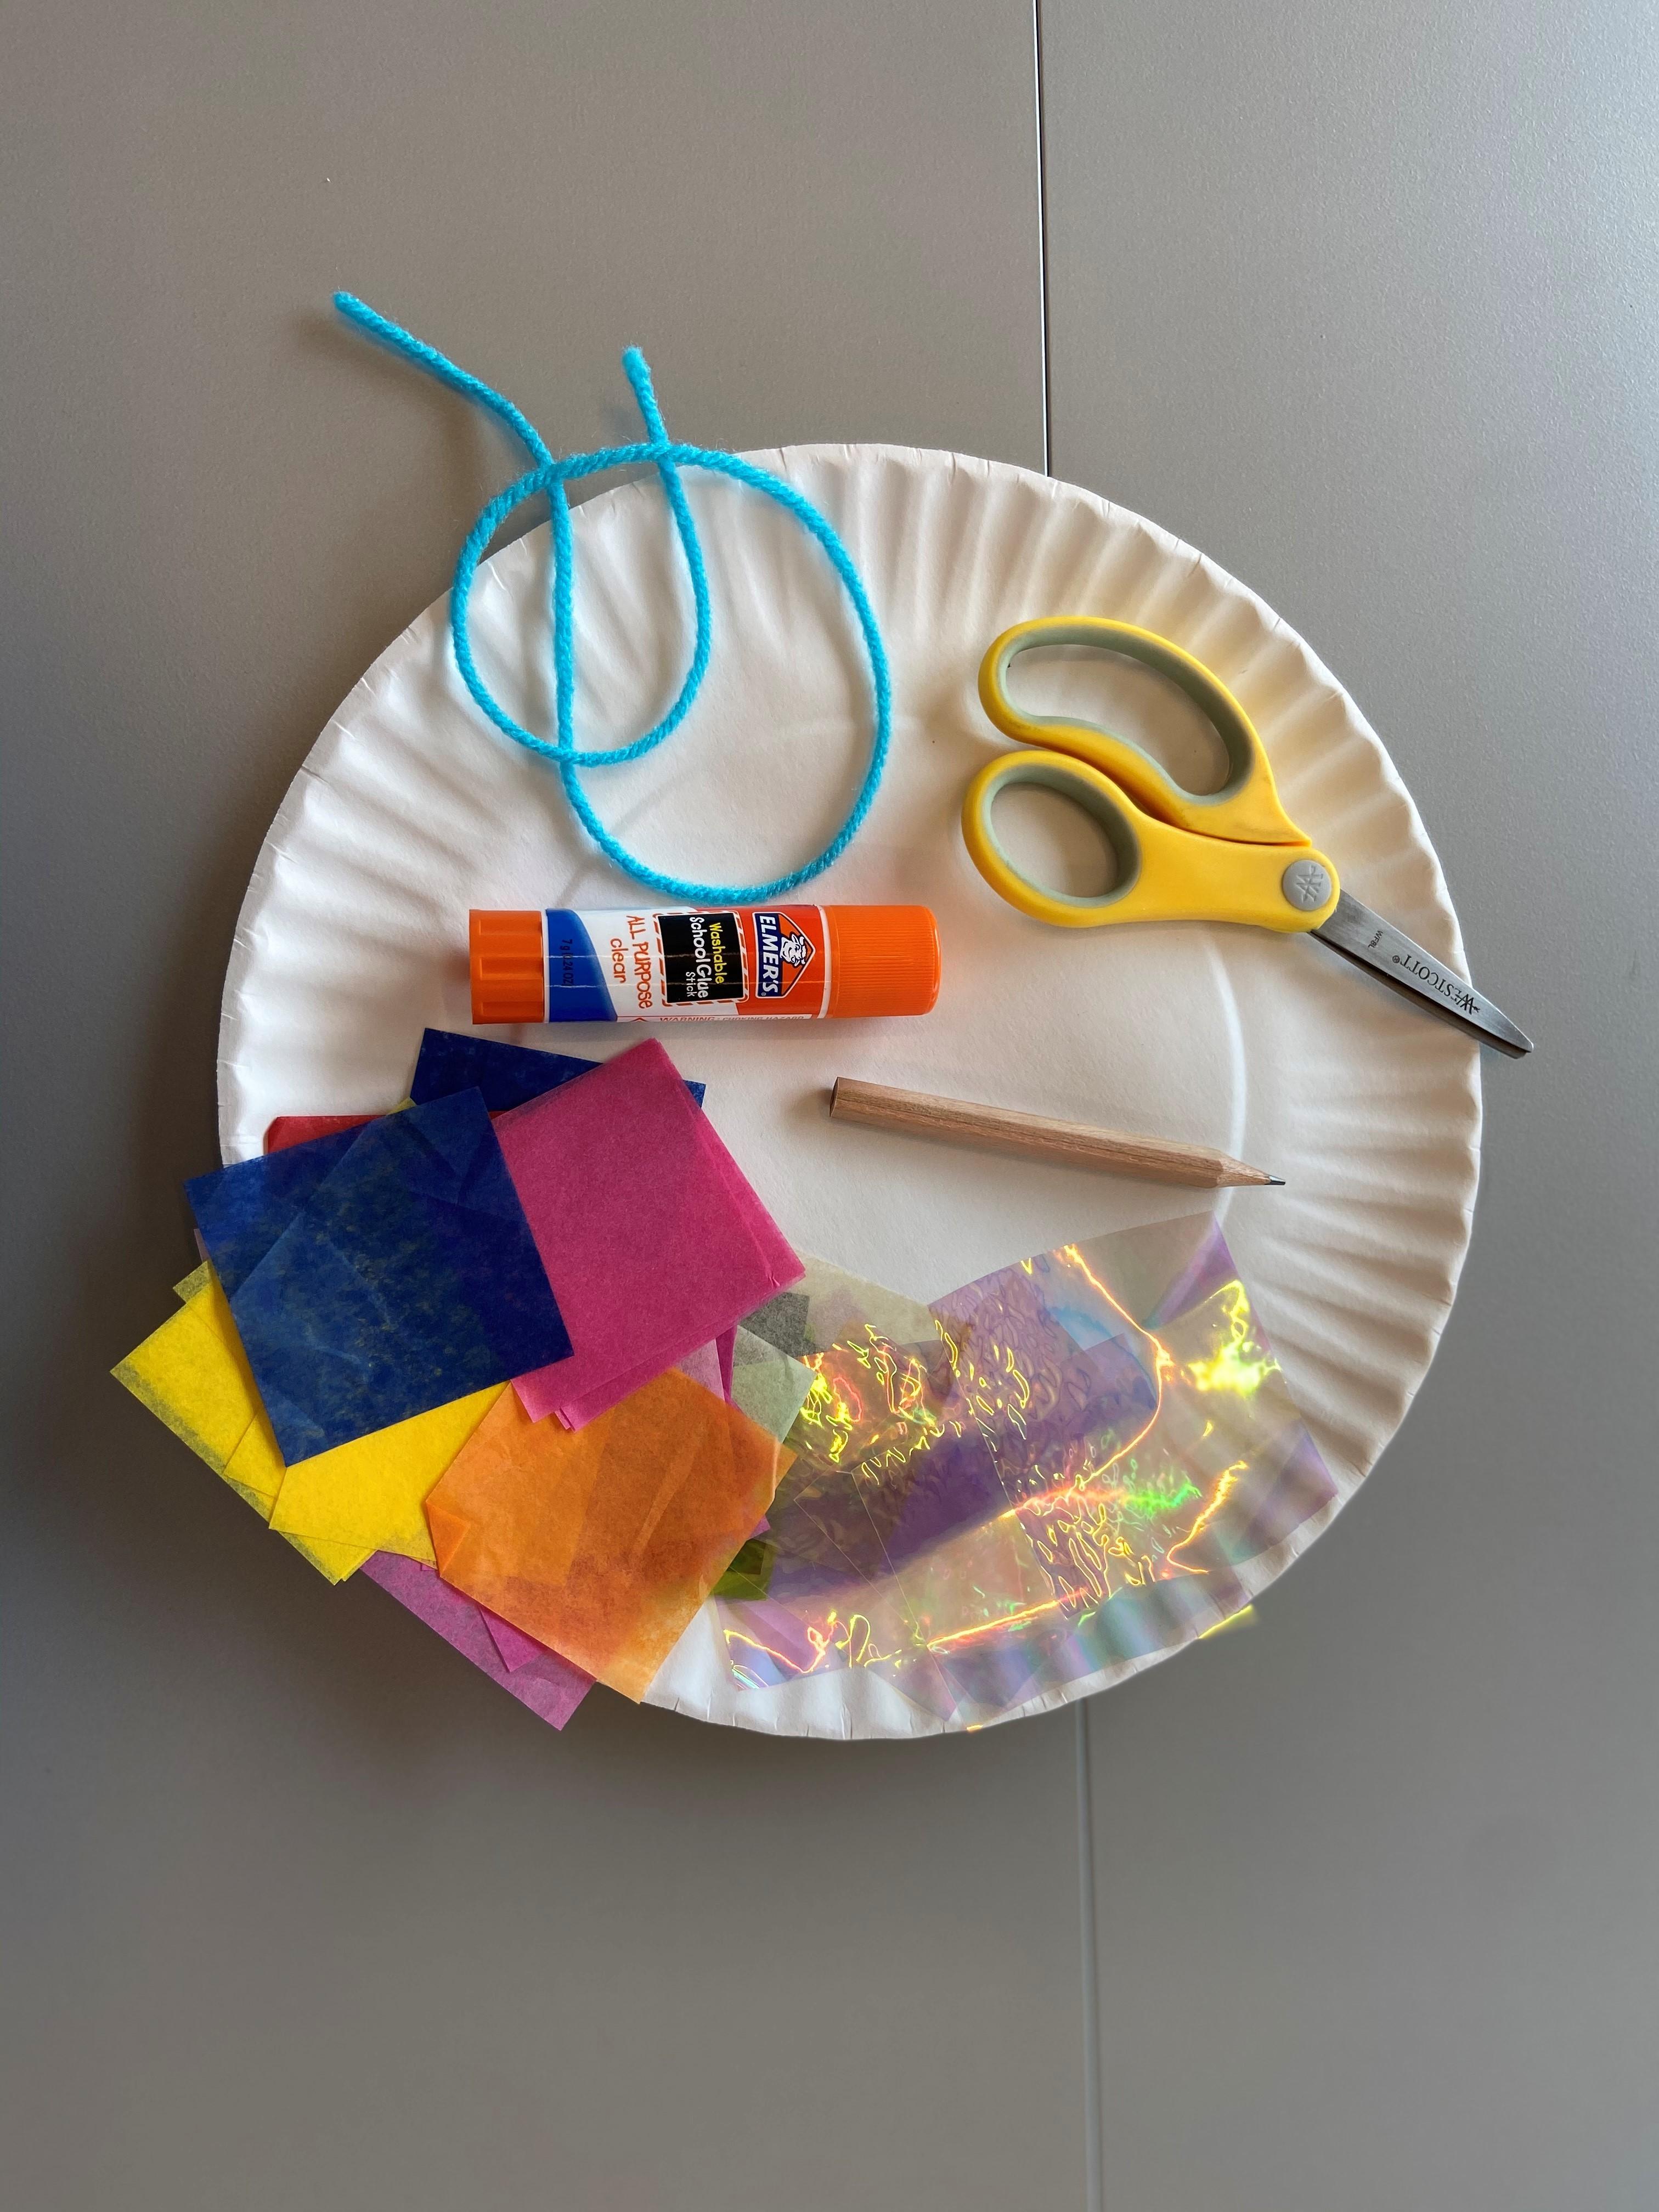 A photo of art supplies on a paper plate: scissors, yarn, glue stick, pencil, etc.